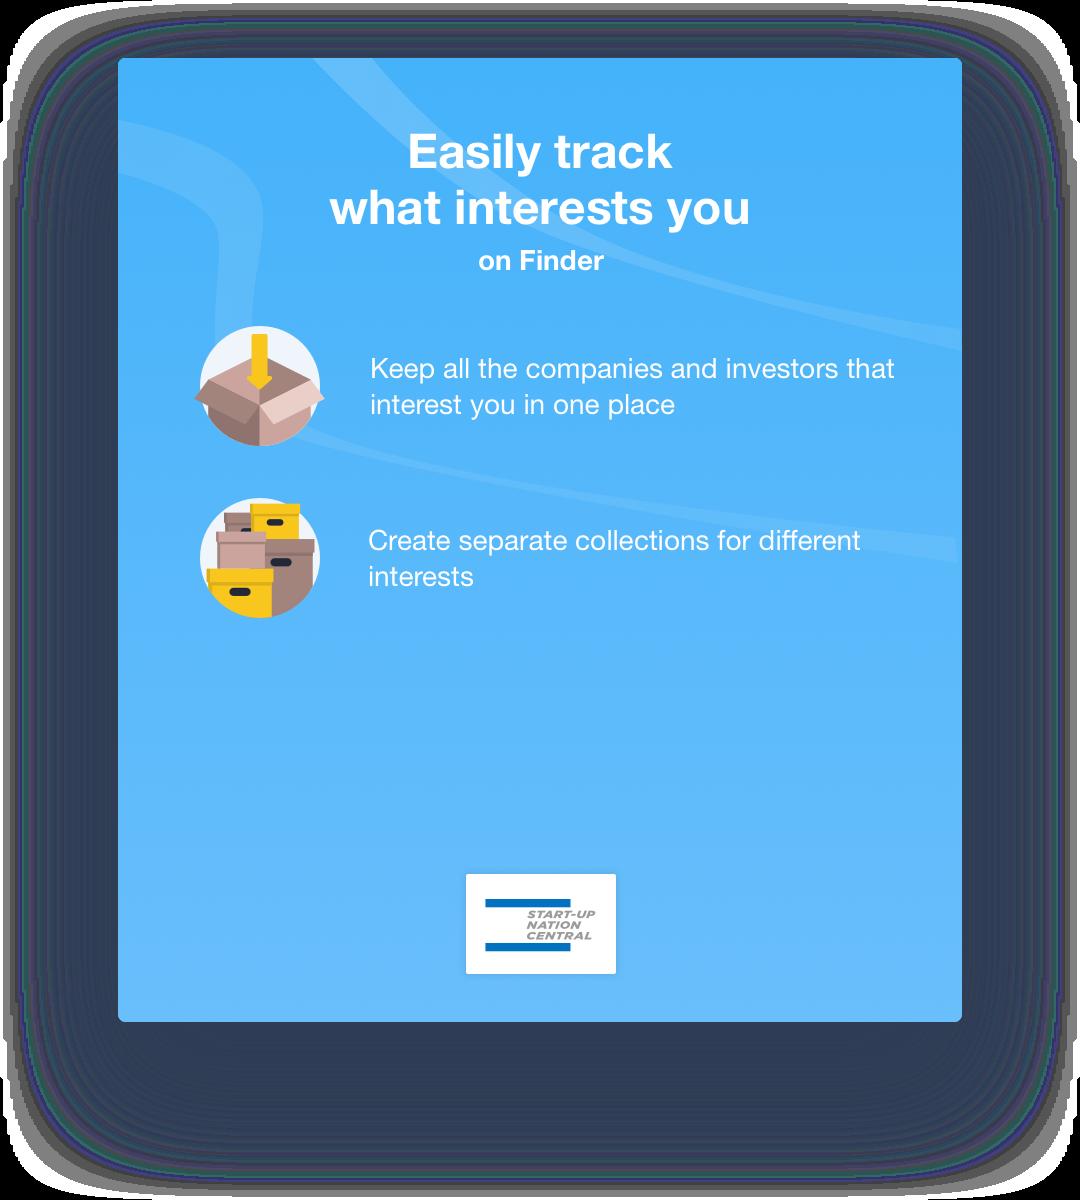 Start-Up Nation Finder sign up promt for collections